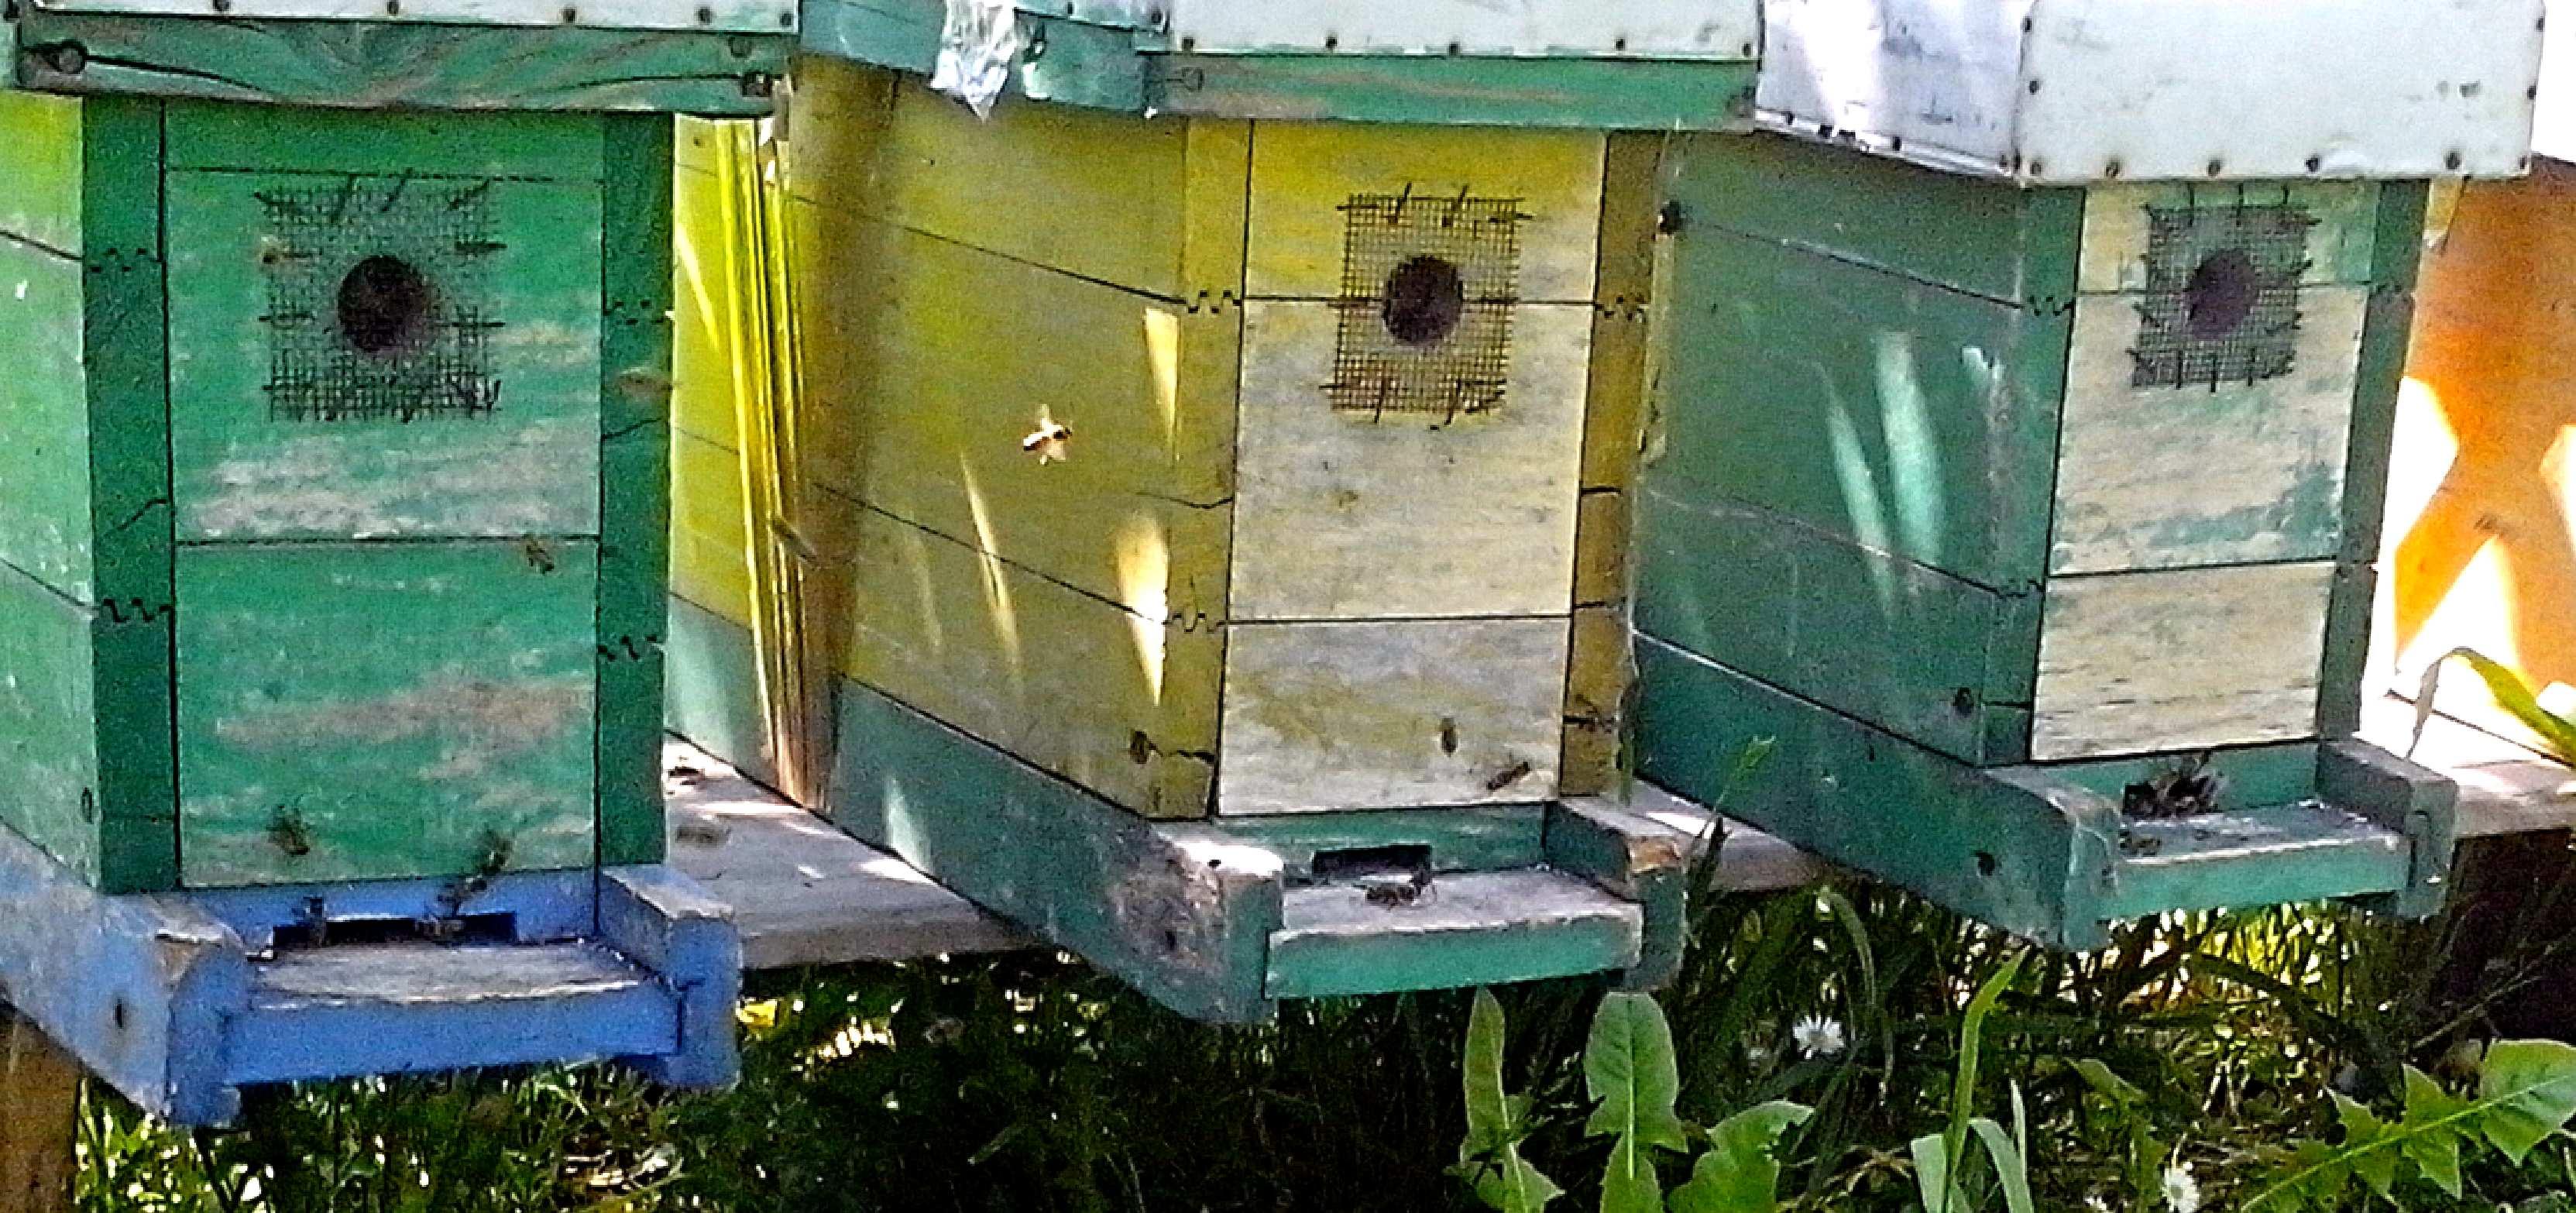 Free photograph; hives, bees